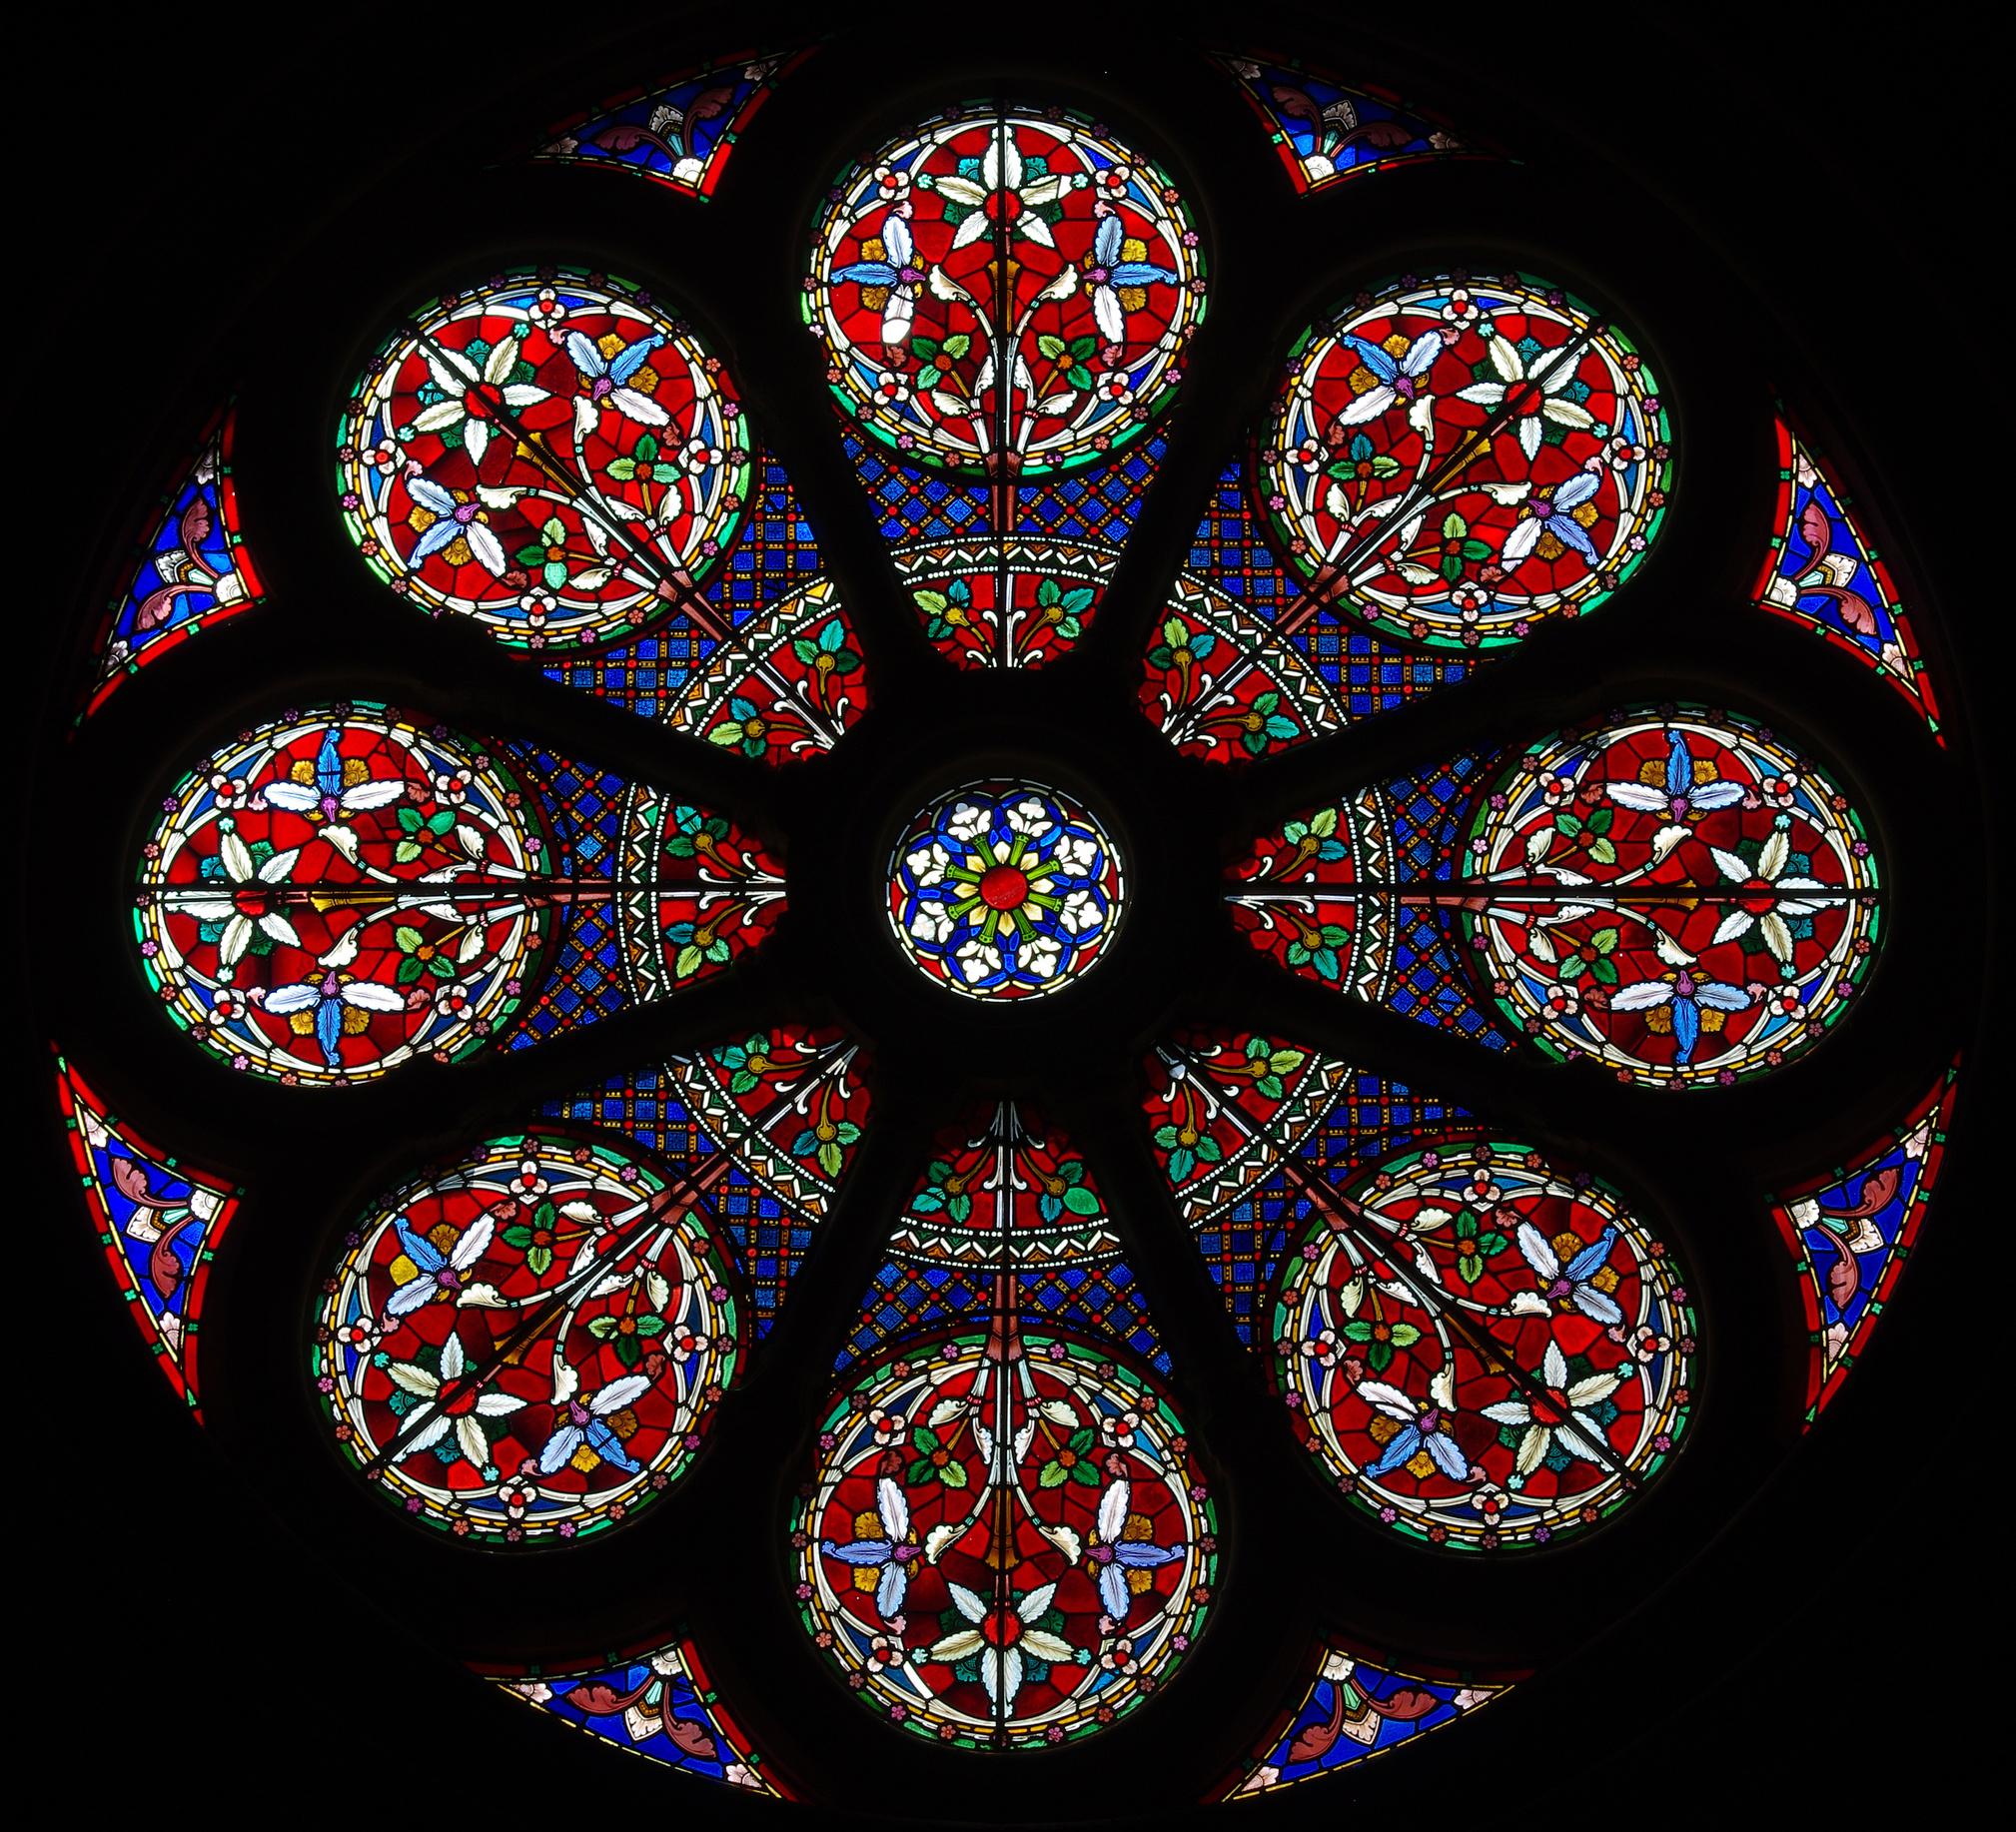 Kirchenfenster @ Howgill / fotolia com